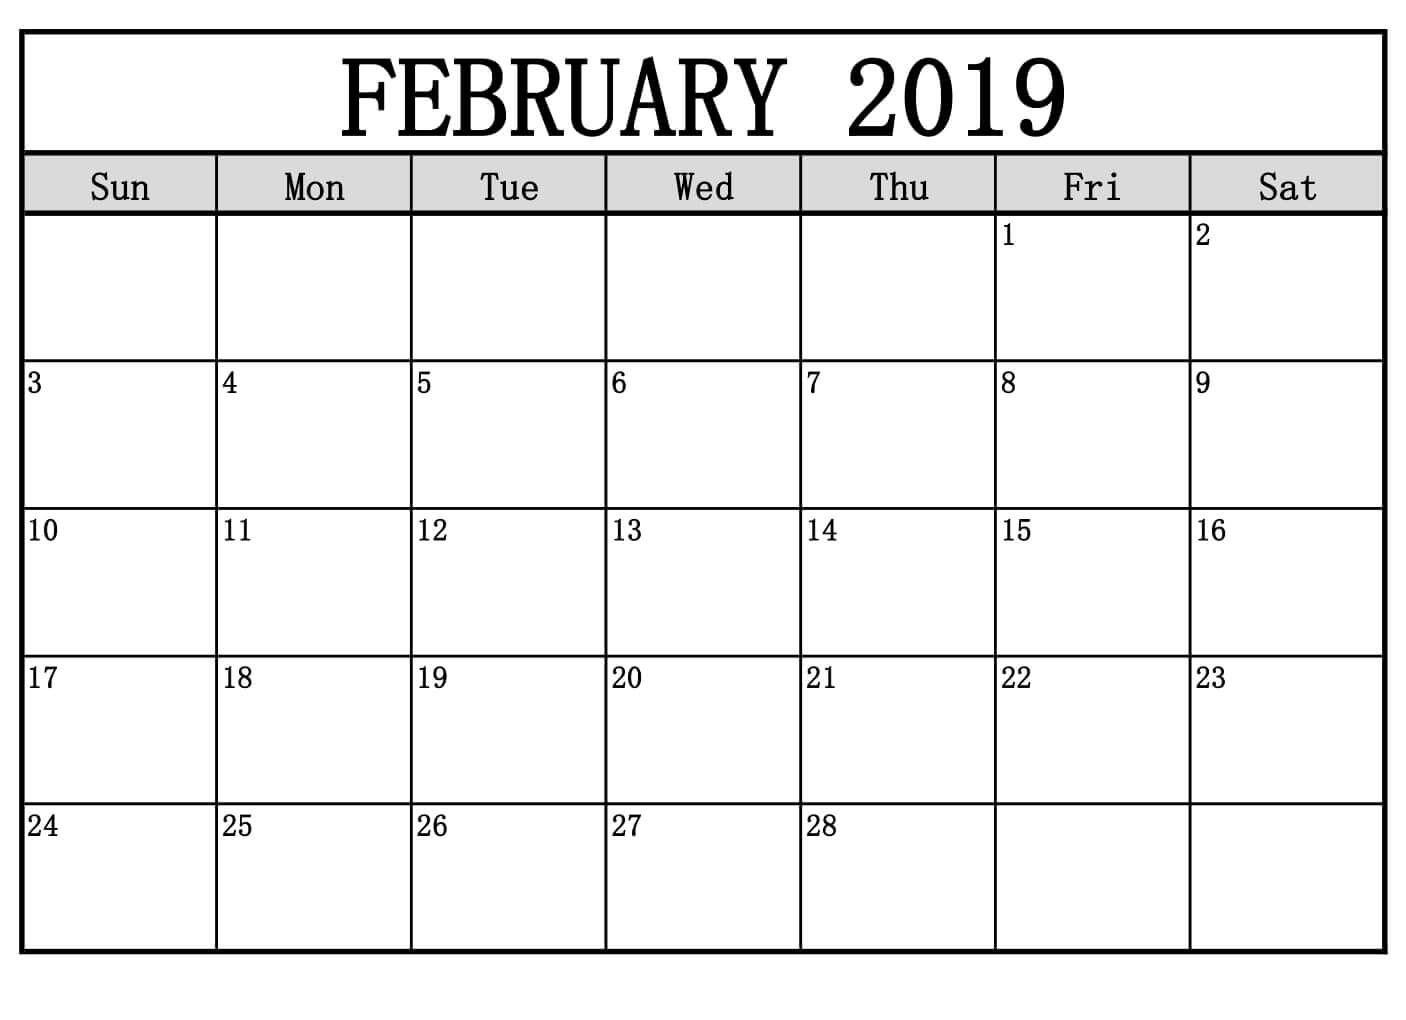 February 2019 Calendar Decorative | Free Printable February